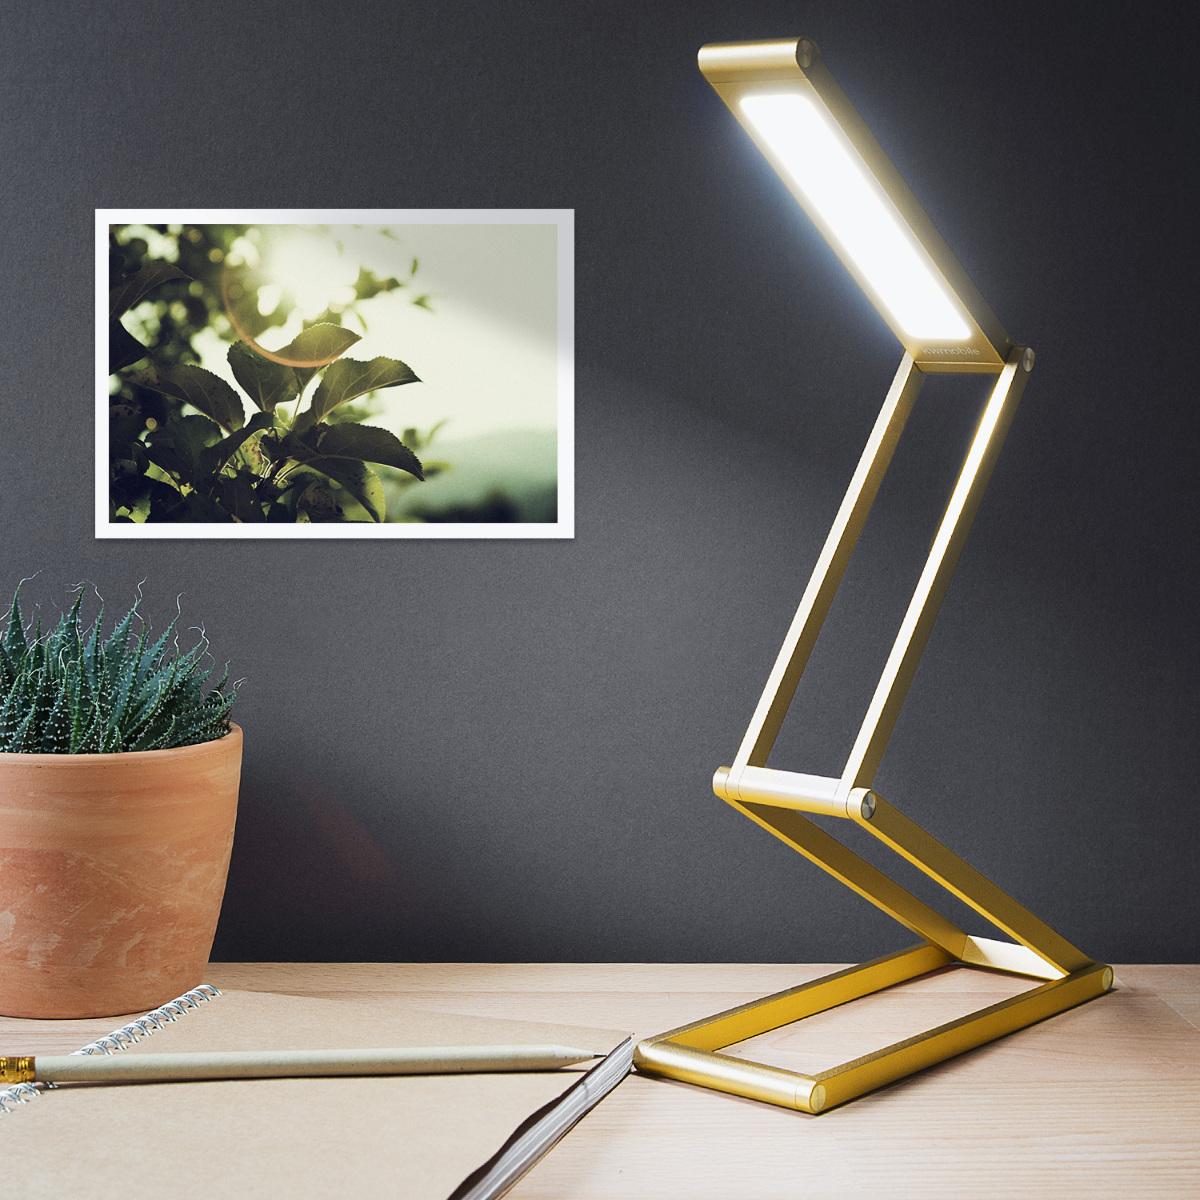 led aluminium tischlampe faltbar akku lampe dimmbar schreibtischlampe ladekabel ebay. Black Bedroom Furniture Sets. Home Design Ideas